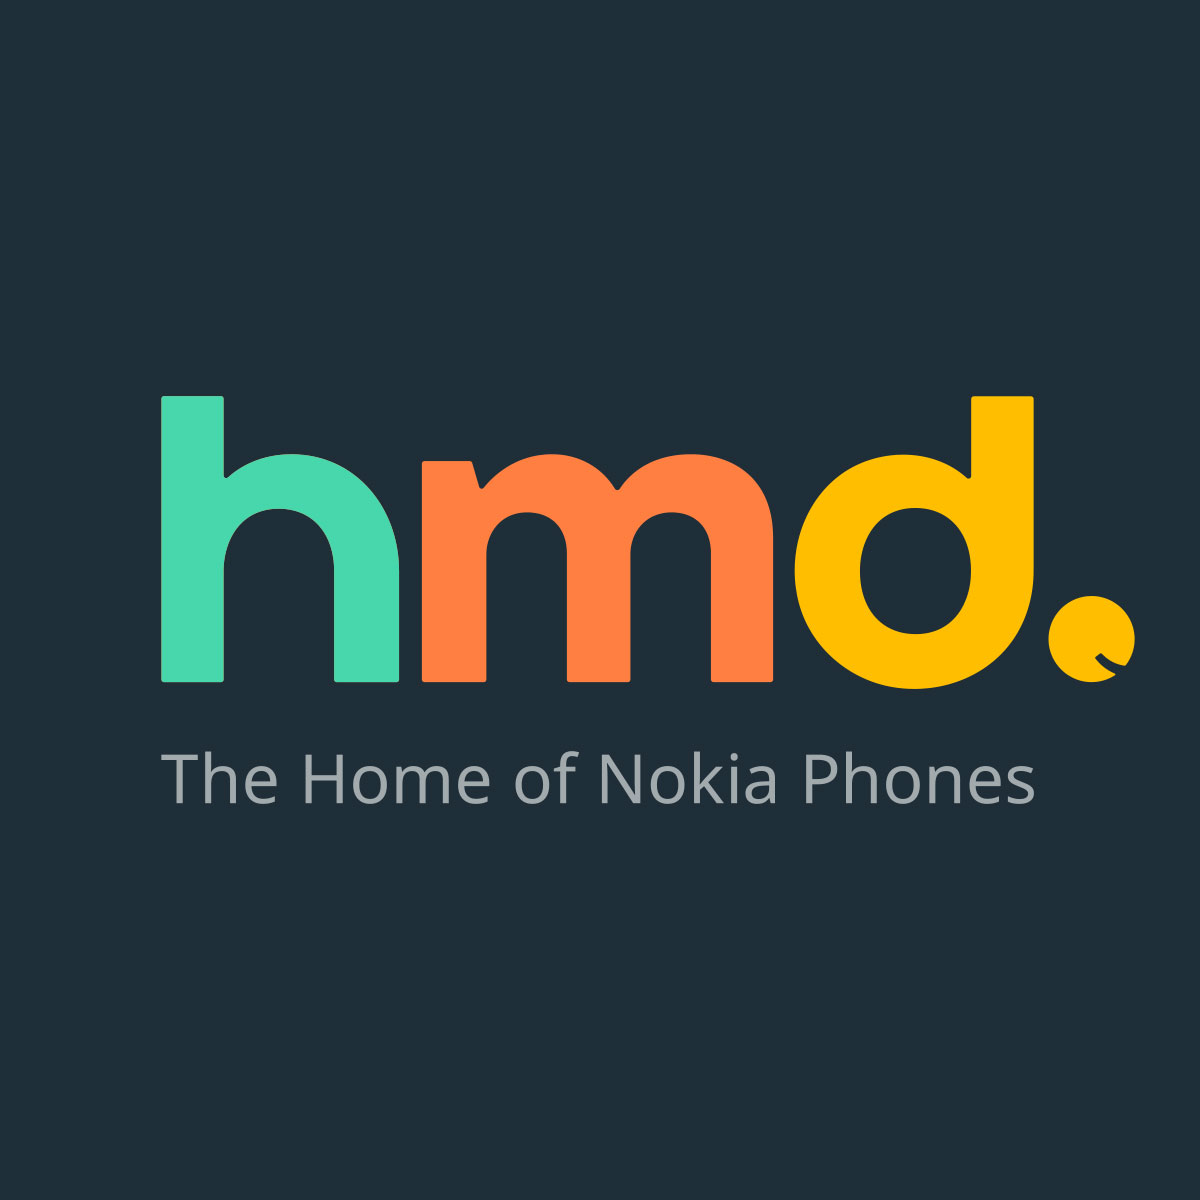 hmd-share.jpg